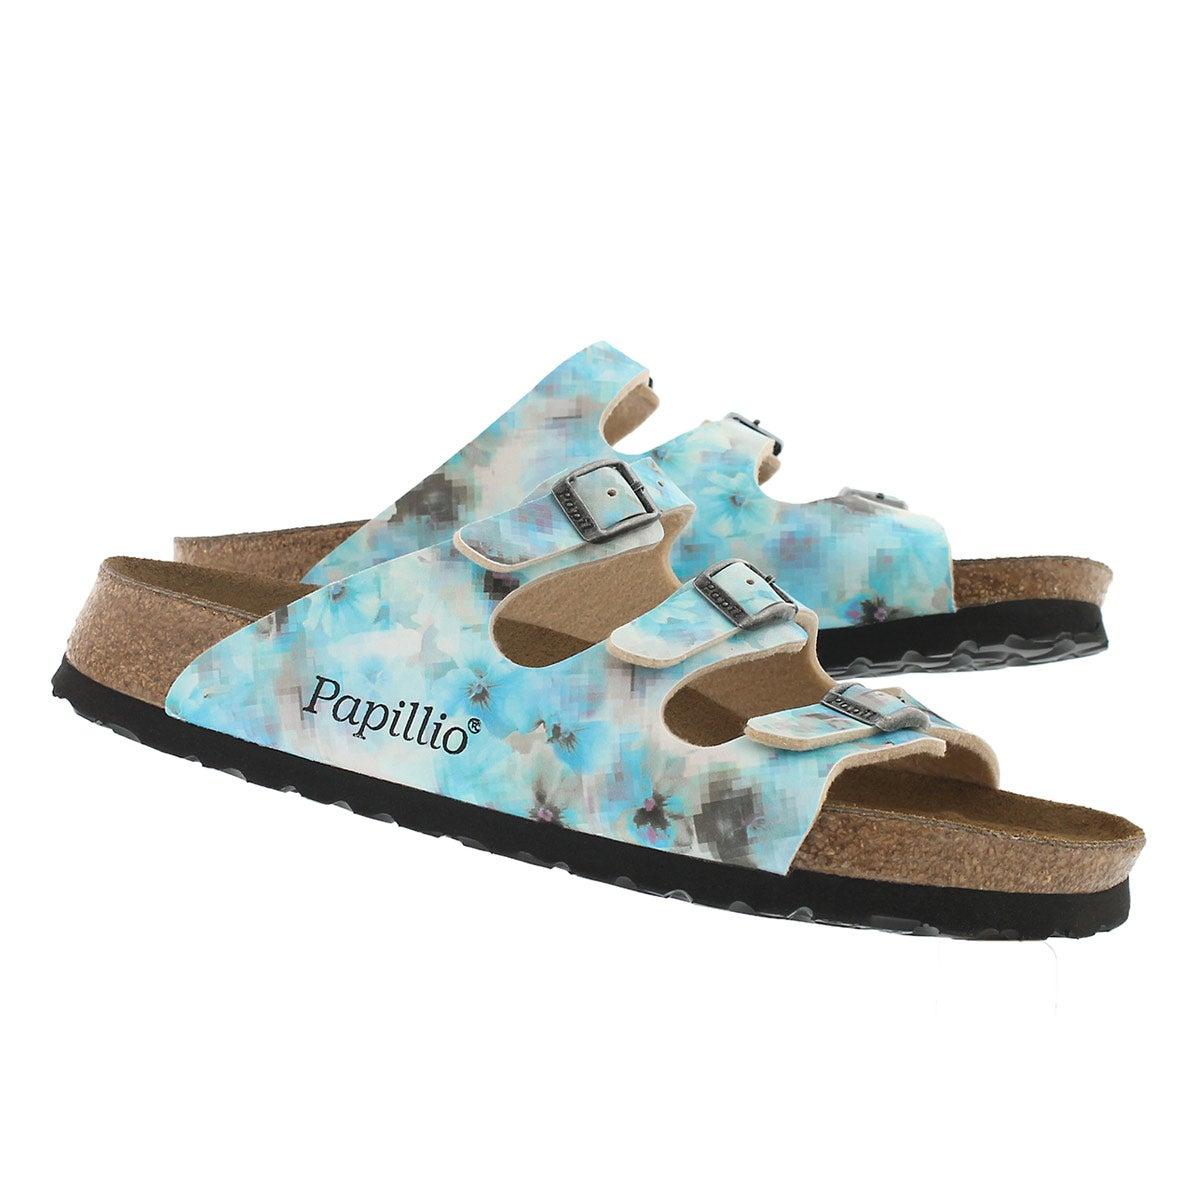 Lds Florida pixel blu BF sandal- Narrow